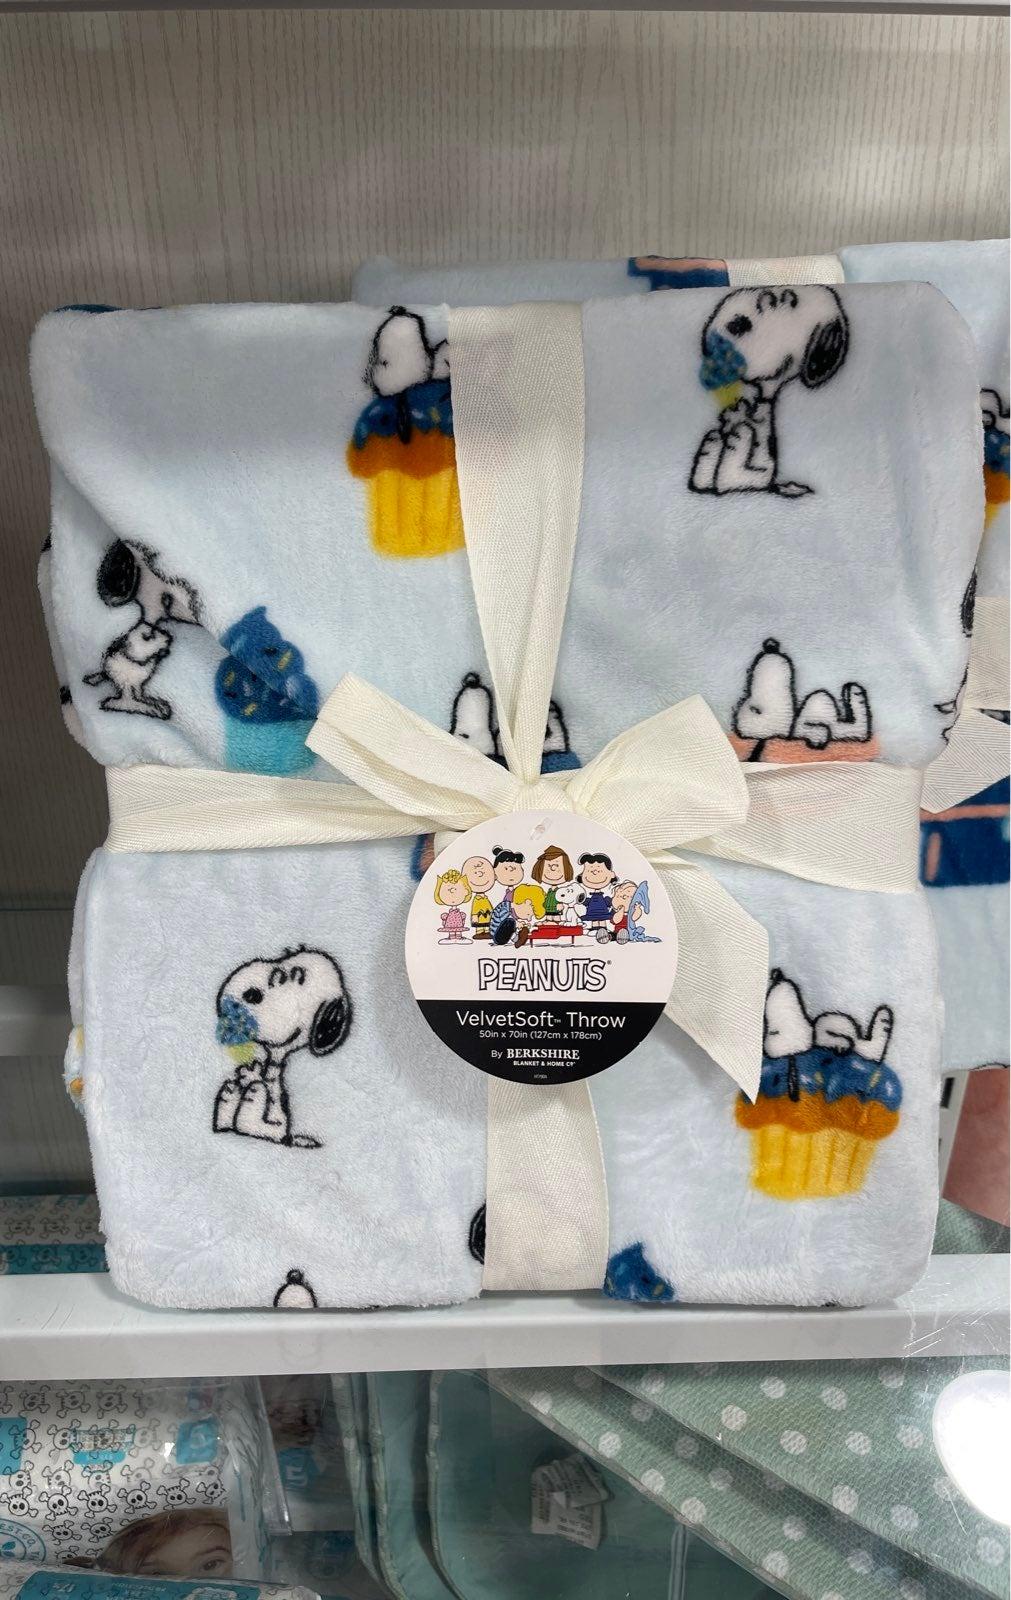 Peanuts Snoopy Cupcake & Sweets Throw